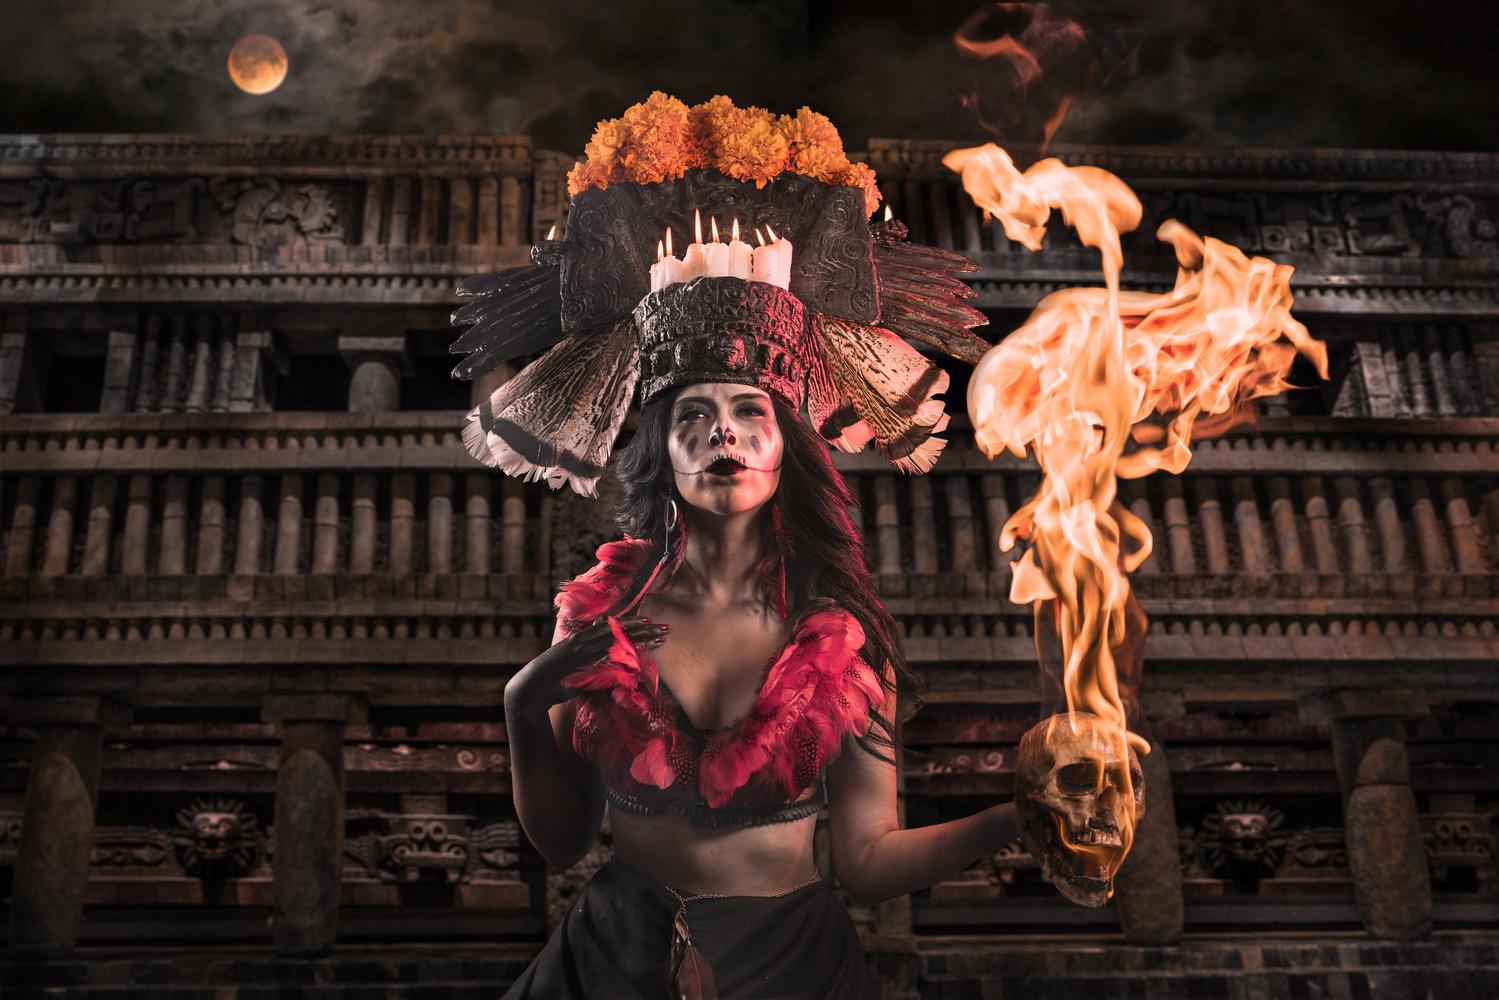 Mictecacíhuatl (Queen of the Underworld) by ERIK VICINO